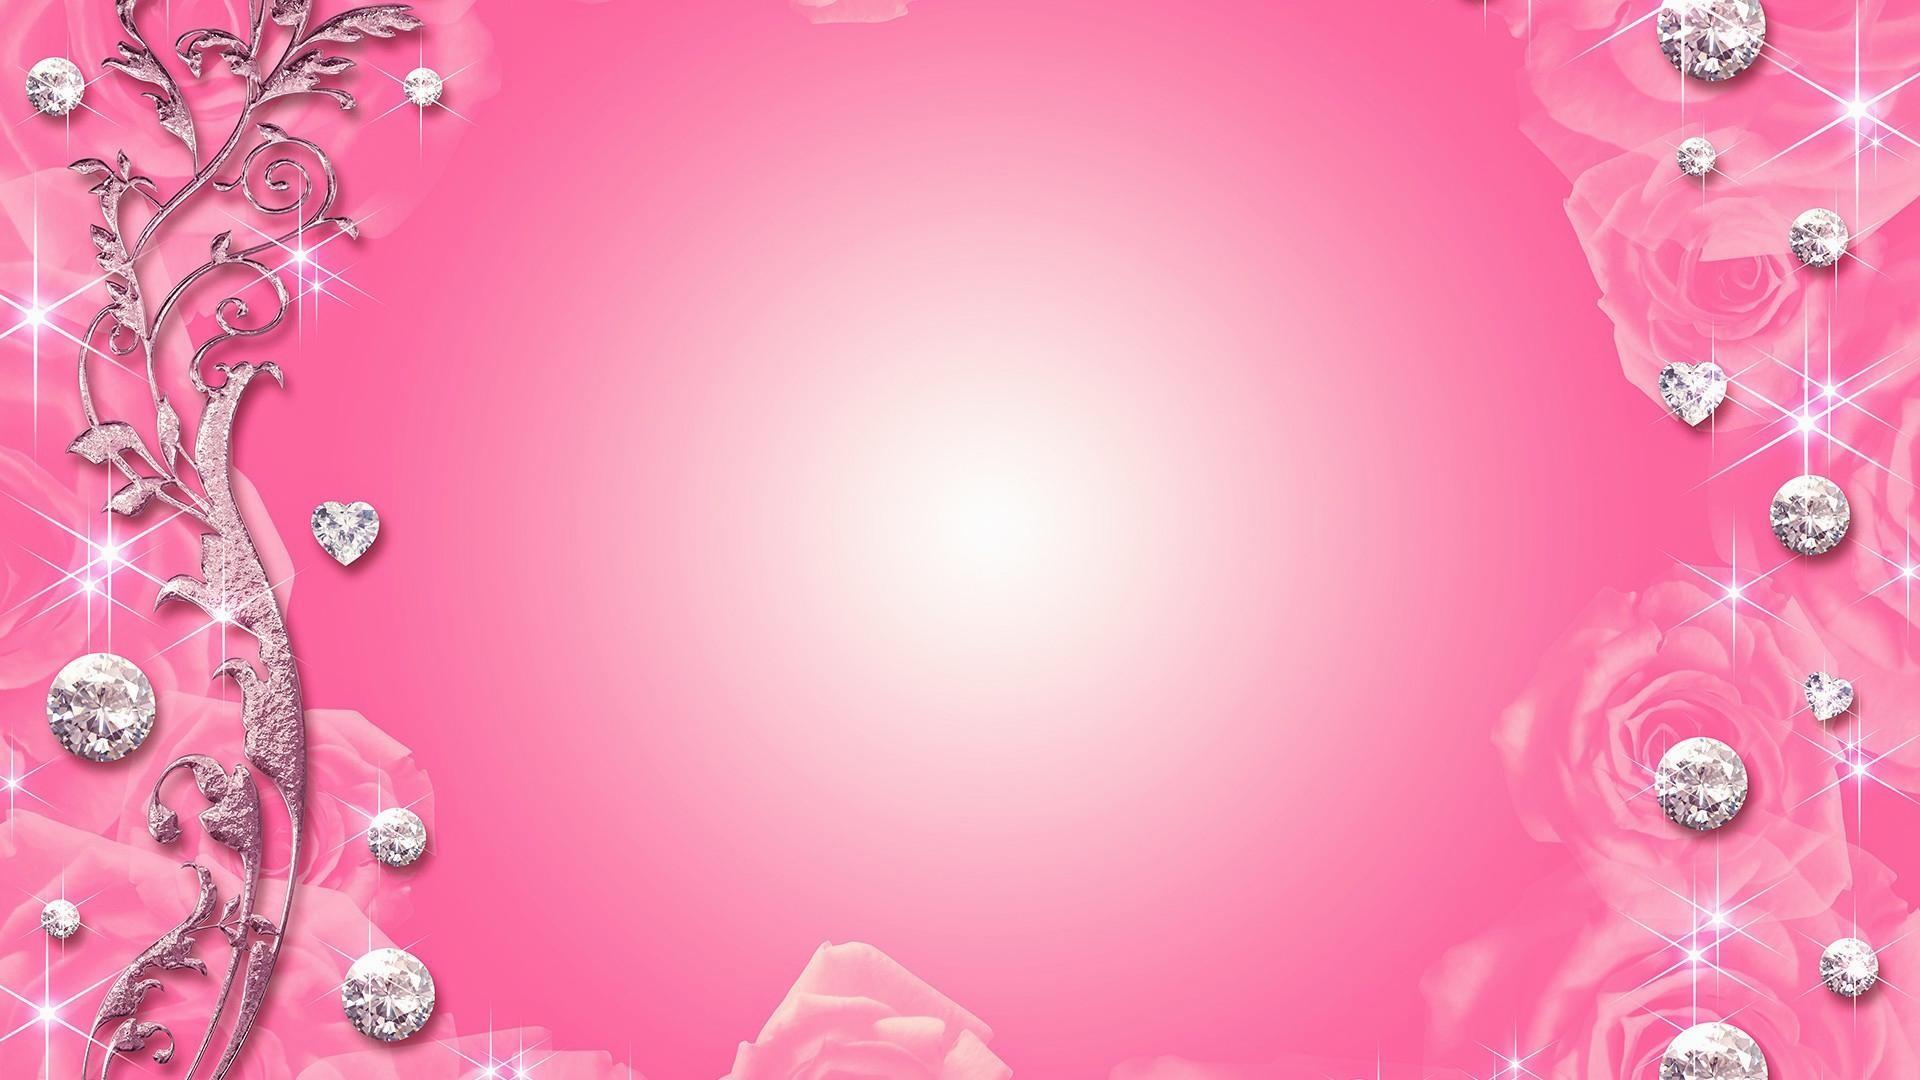 6. hot-pink-desktop-wallpaper6-600×338